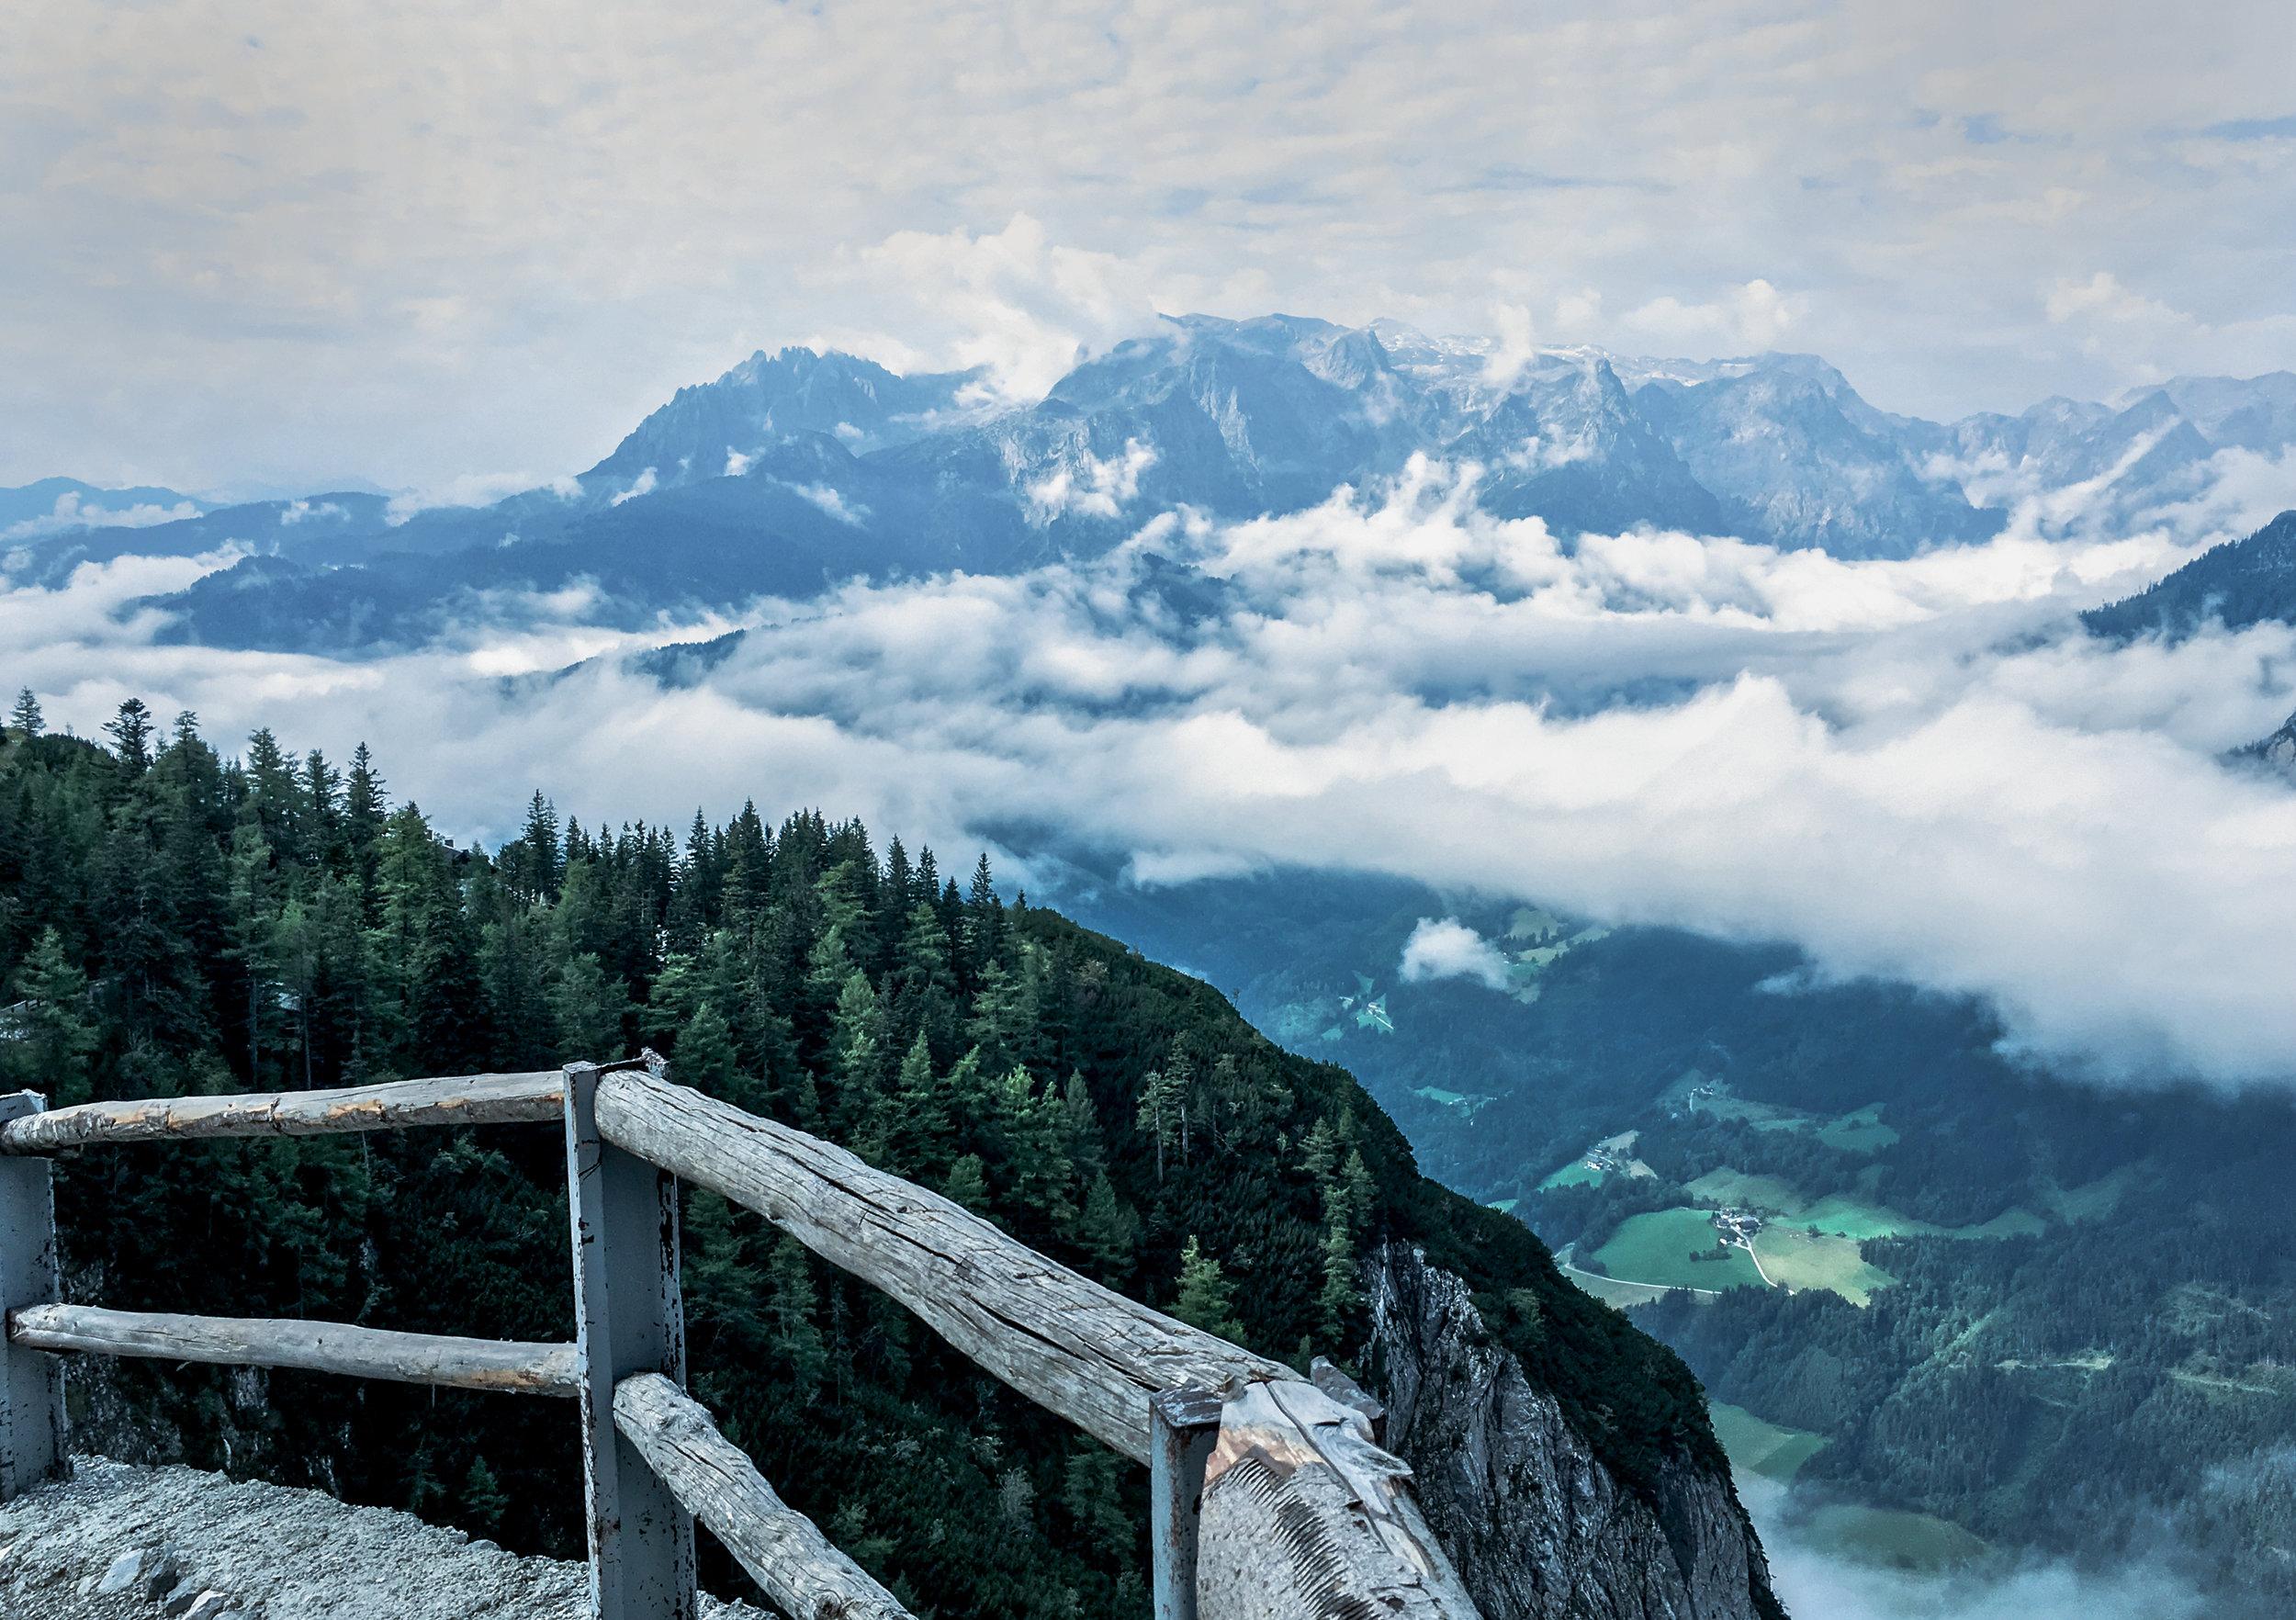 Panaroma View from Eisriesenwelt